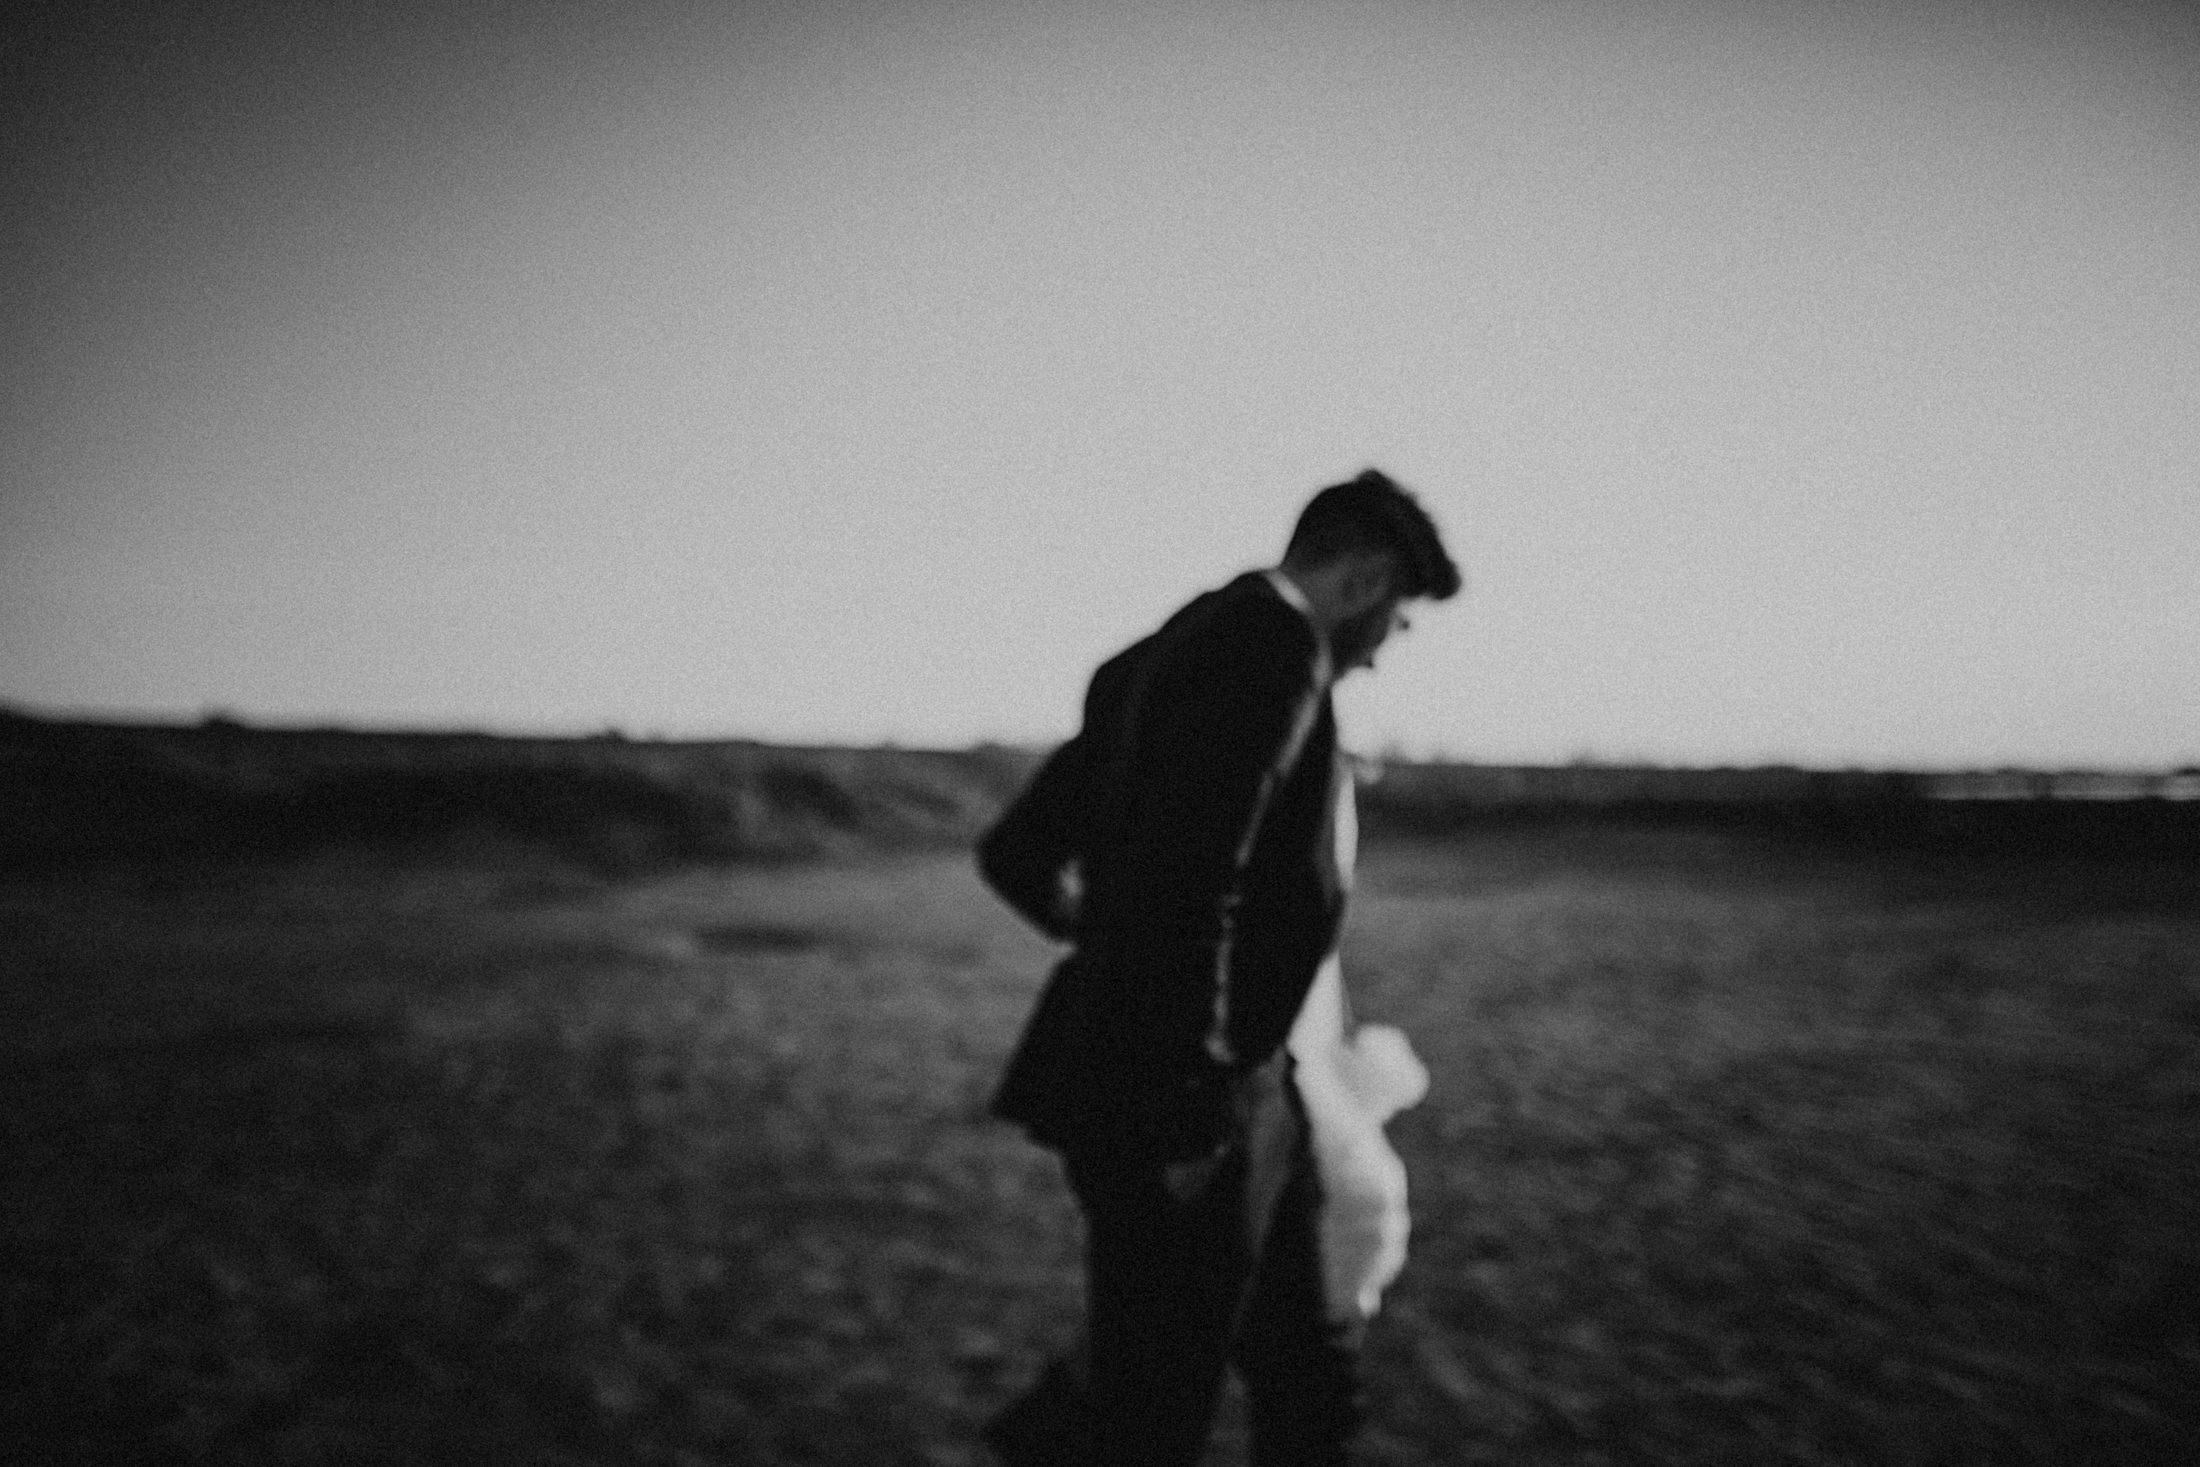 Wedding_Photographer_Mallorca_Daniela-Marquardt_Photography_CanaryIslands_Lanzarote_Iceland_Tuskany_Santorini_Portugal_Schweiz_Austria_Bayern_Elopement_Hochzeitsfotograf_Norddeichich_58